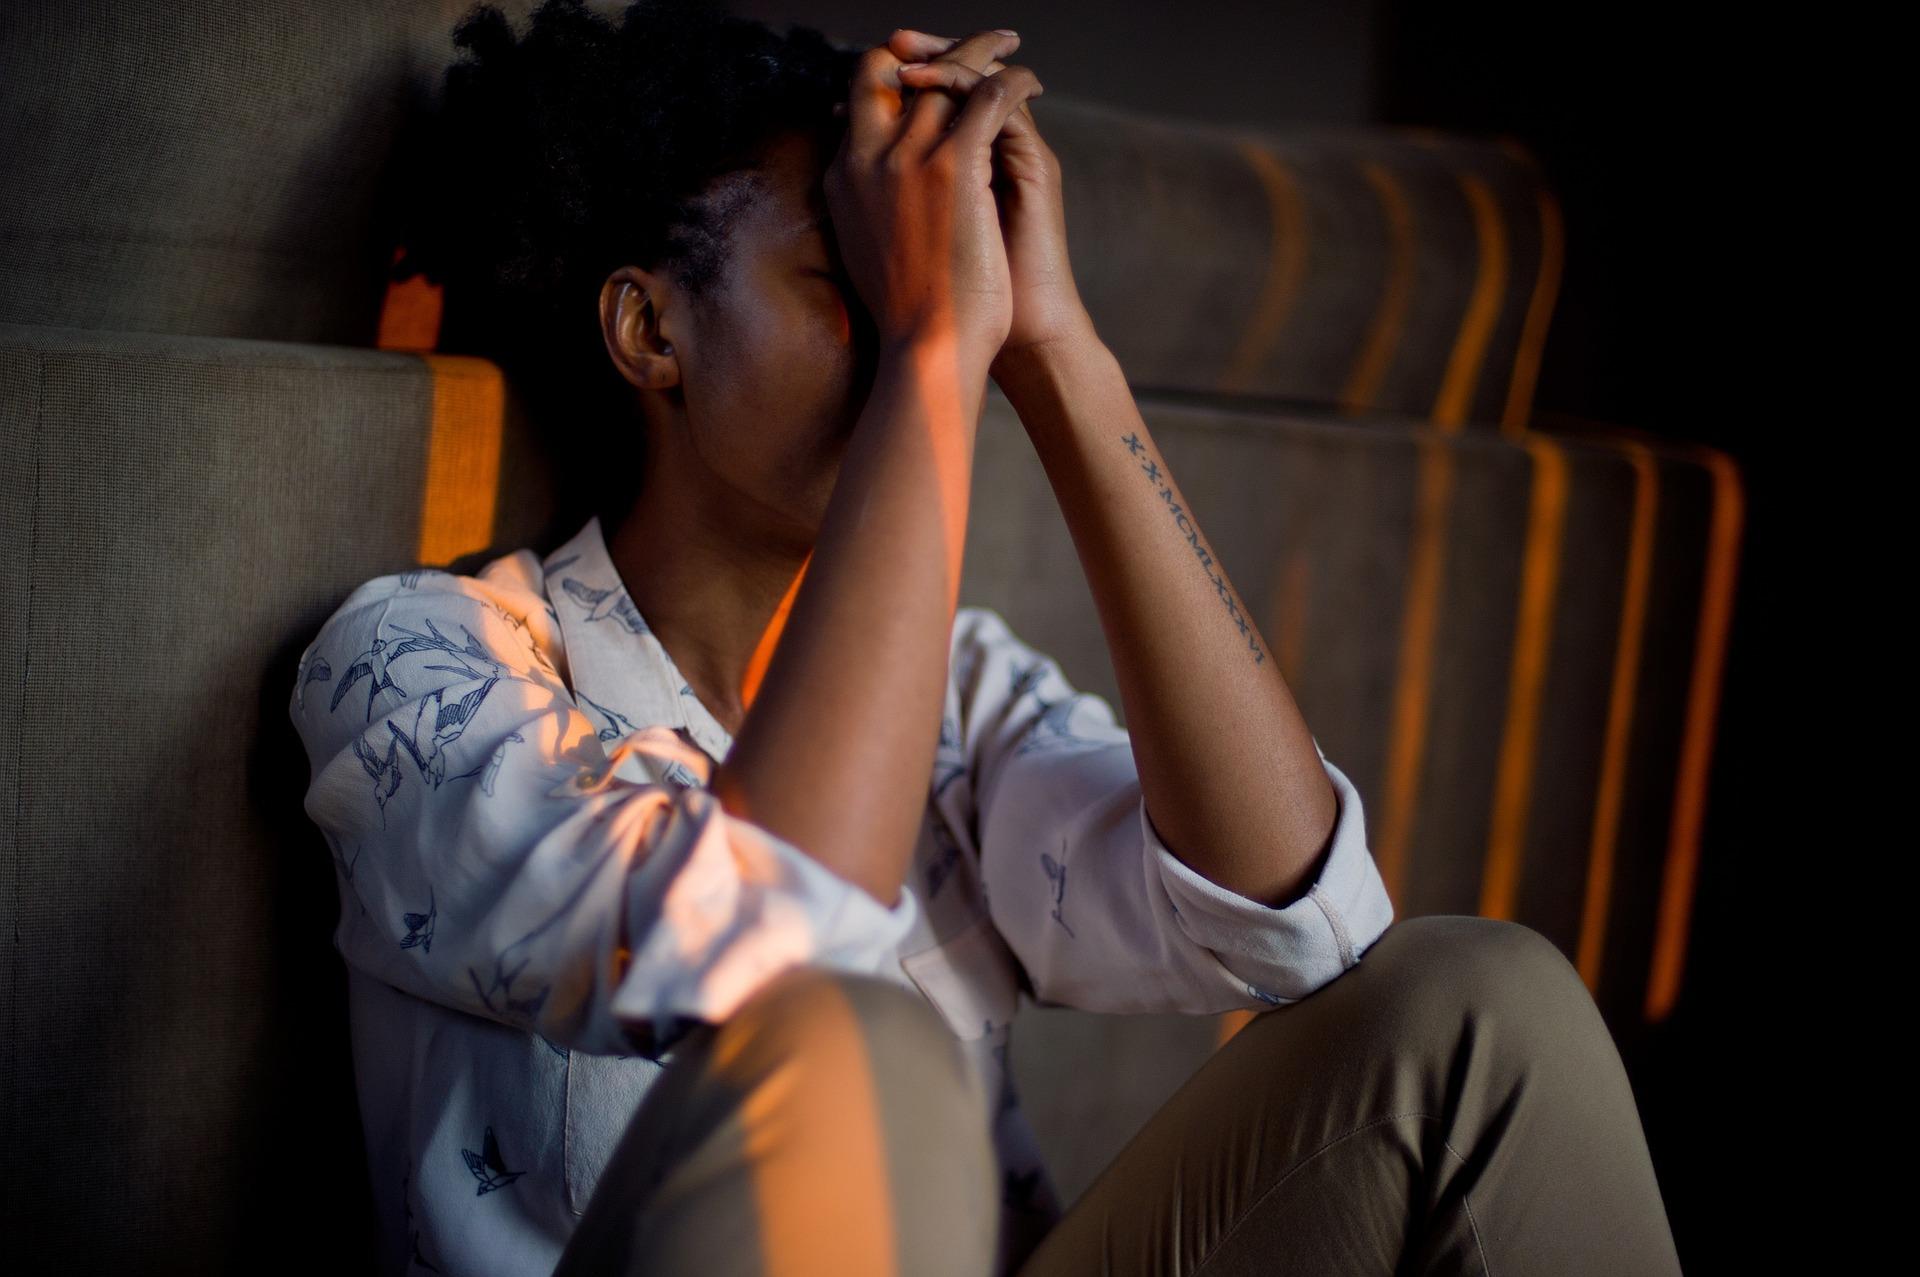 lonely women sad depression